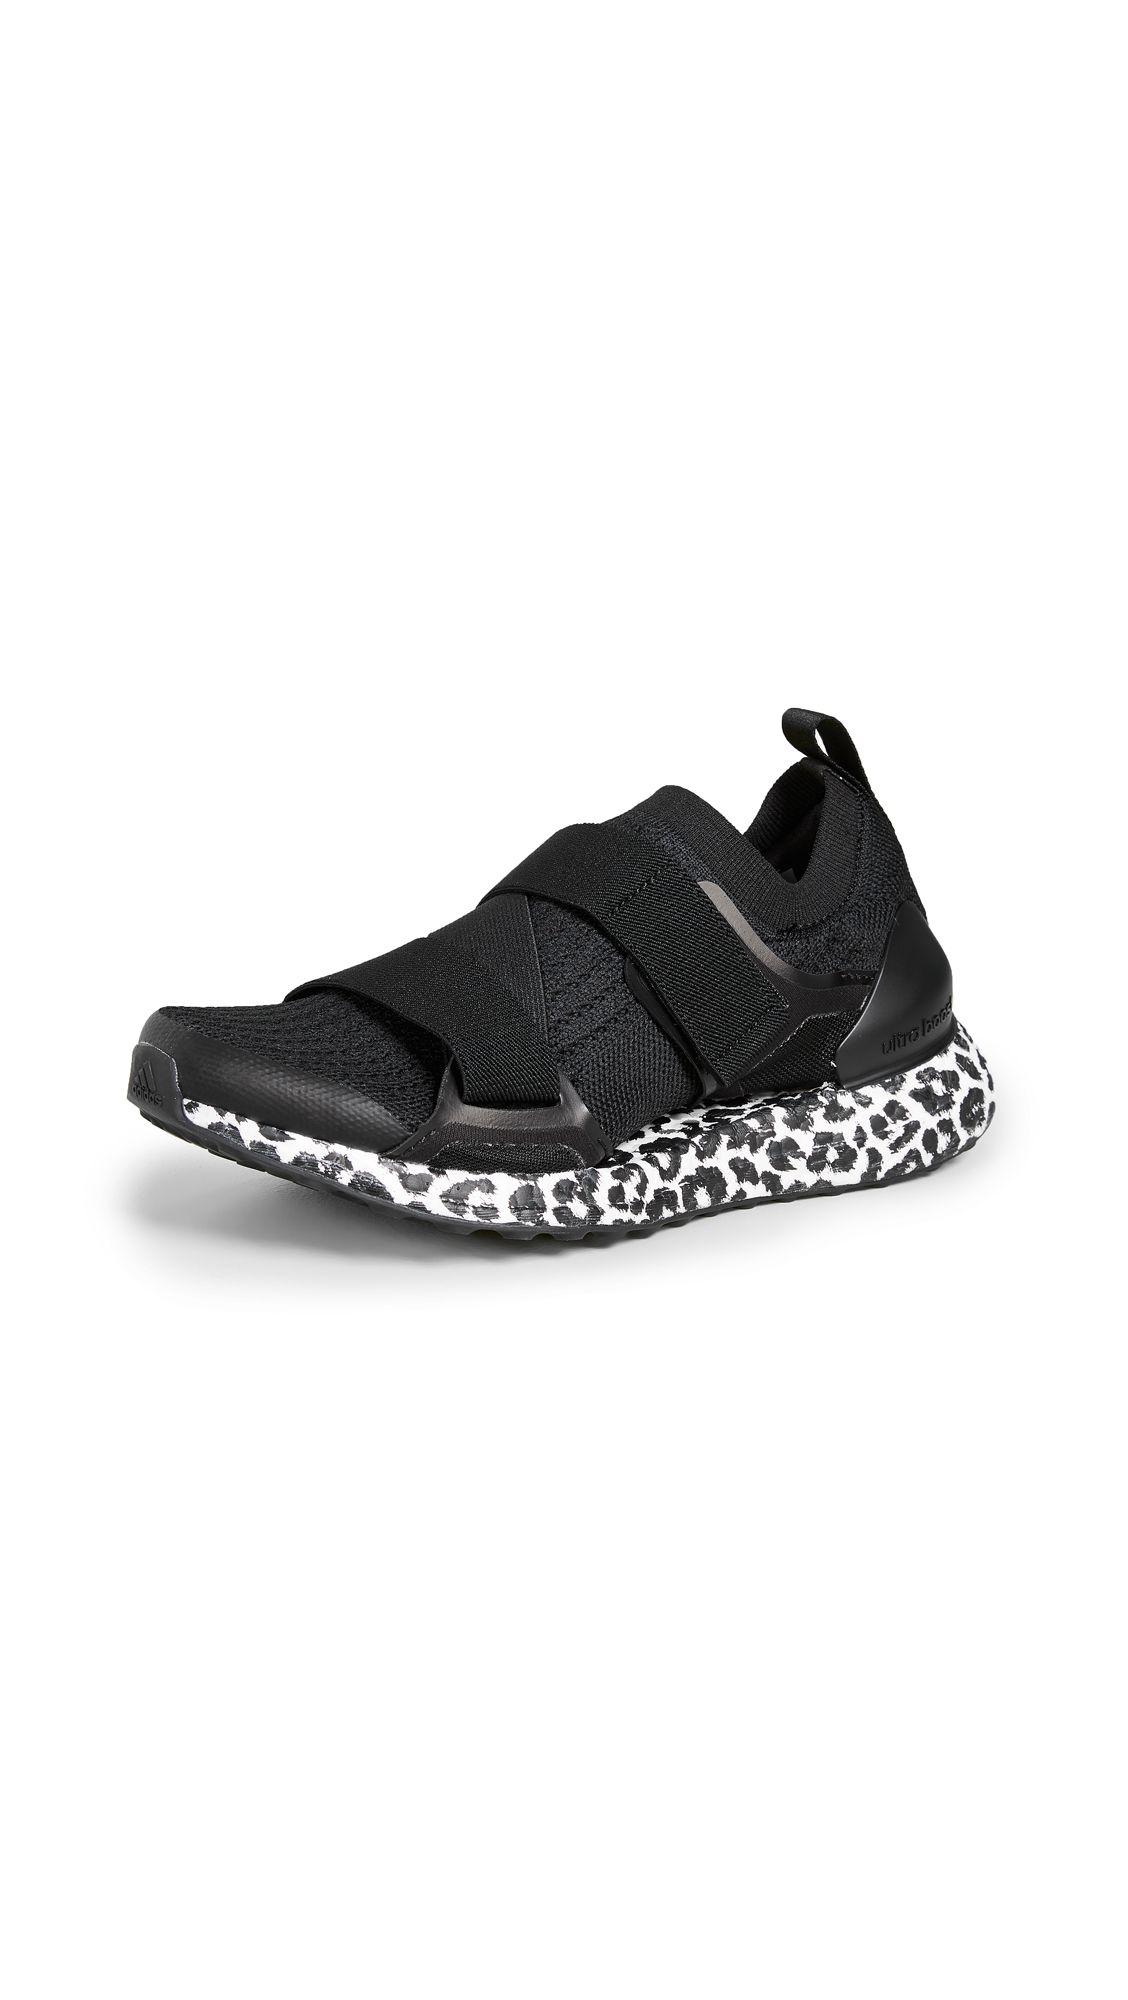 ca26d86460e3 ADIDAS BY STELLA MCCARTNEY ULTRABOOST X SNEAKERS.  adidasbystellamccartney   shoes